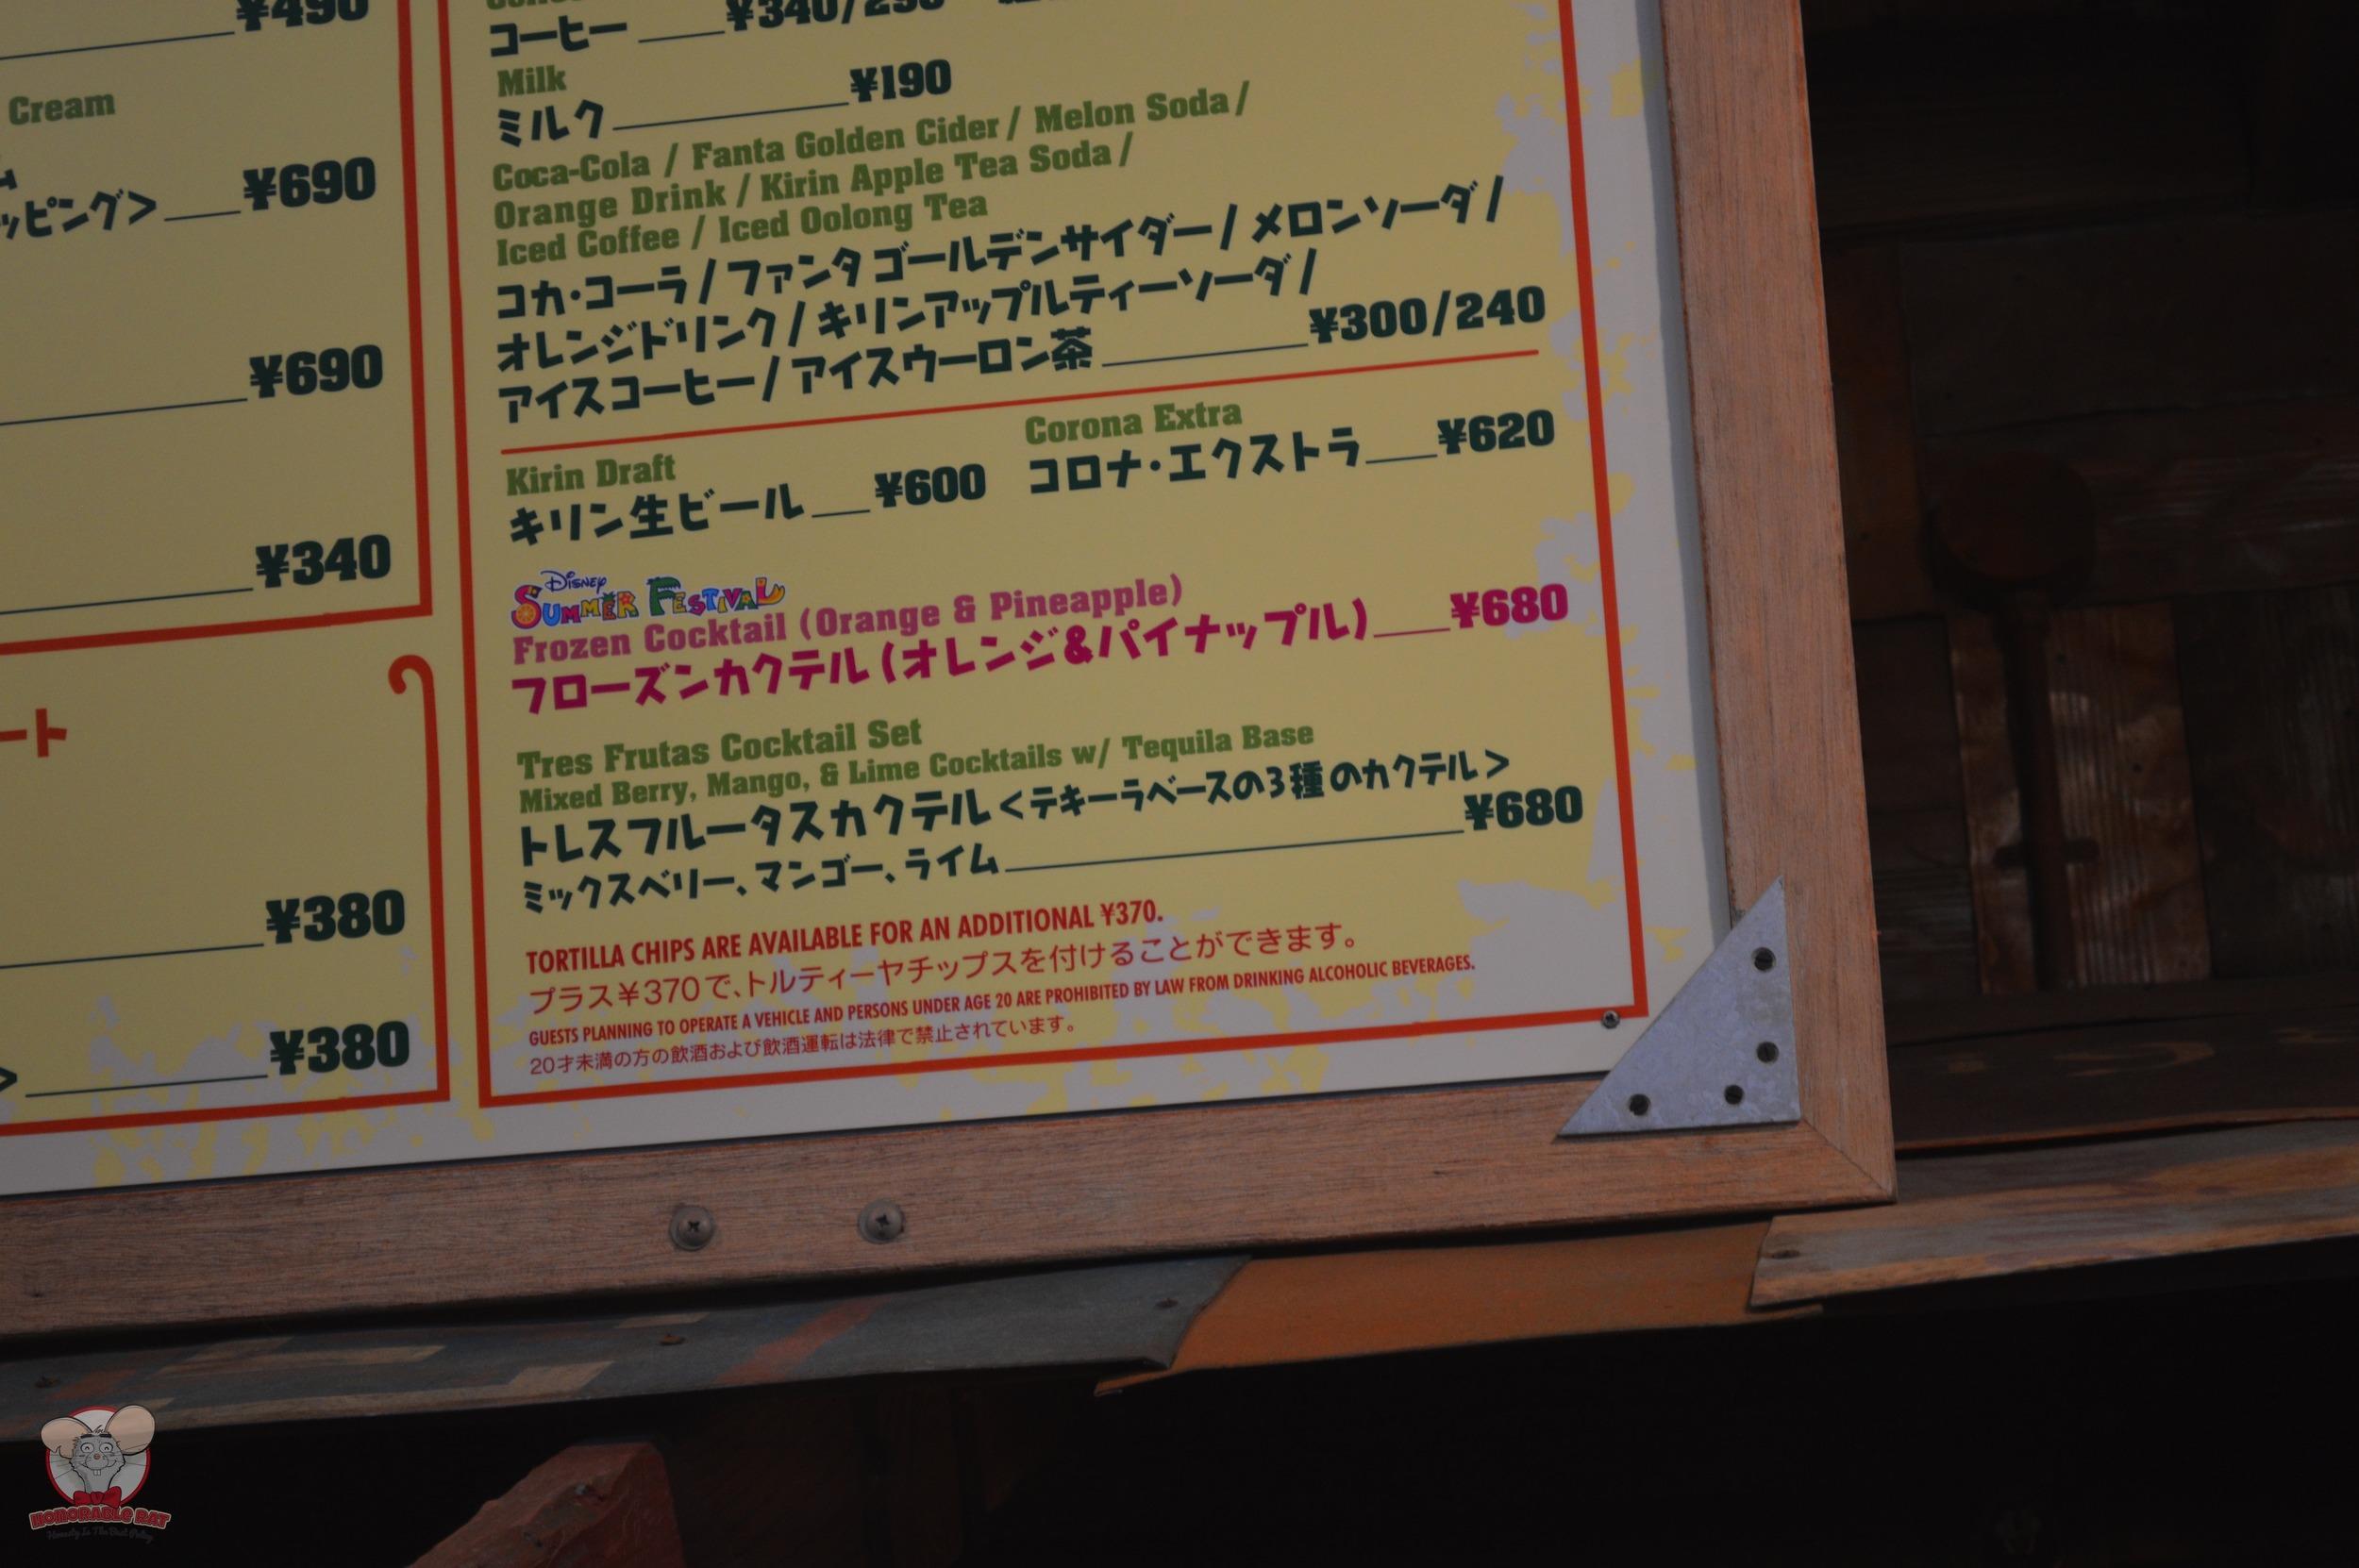 Tres Frutas Cocktail Set for 680 yen